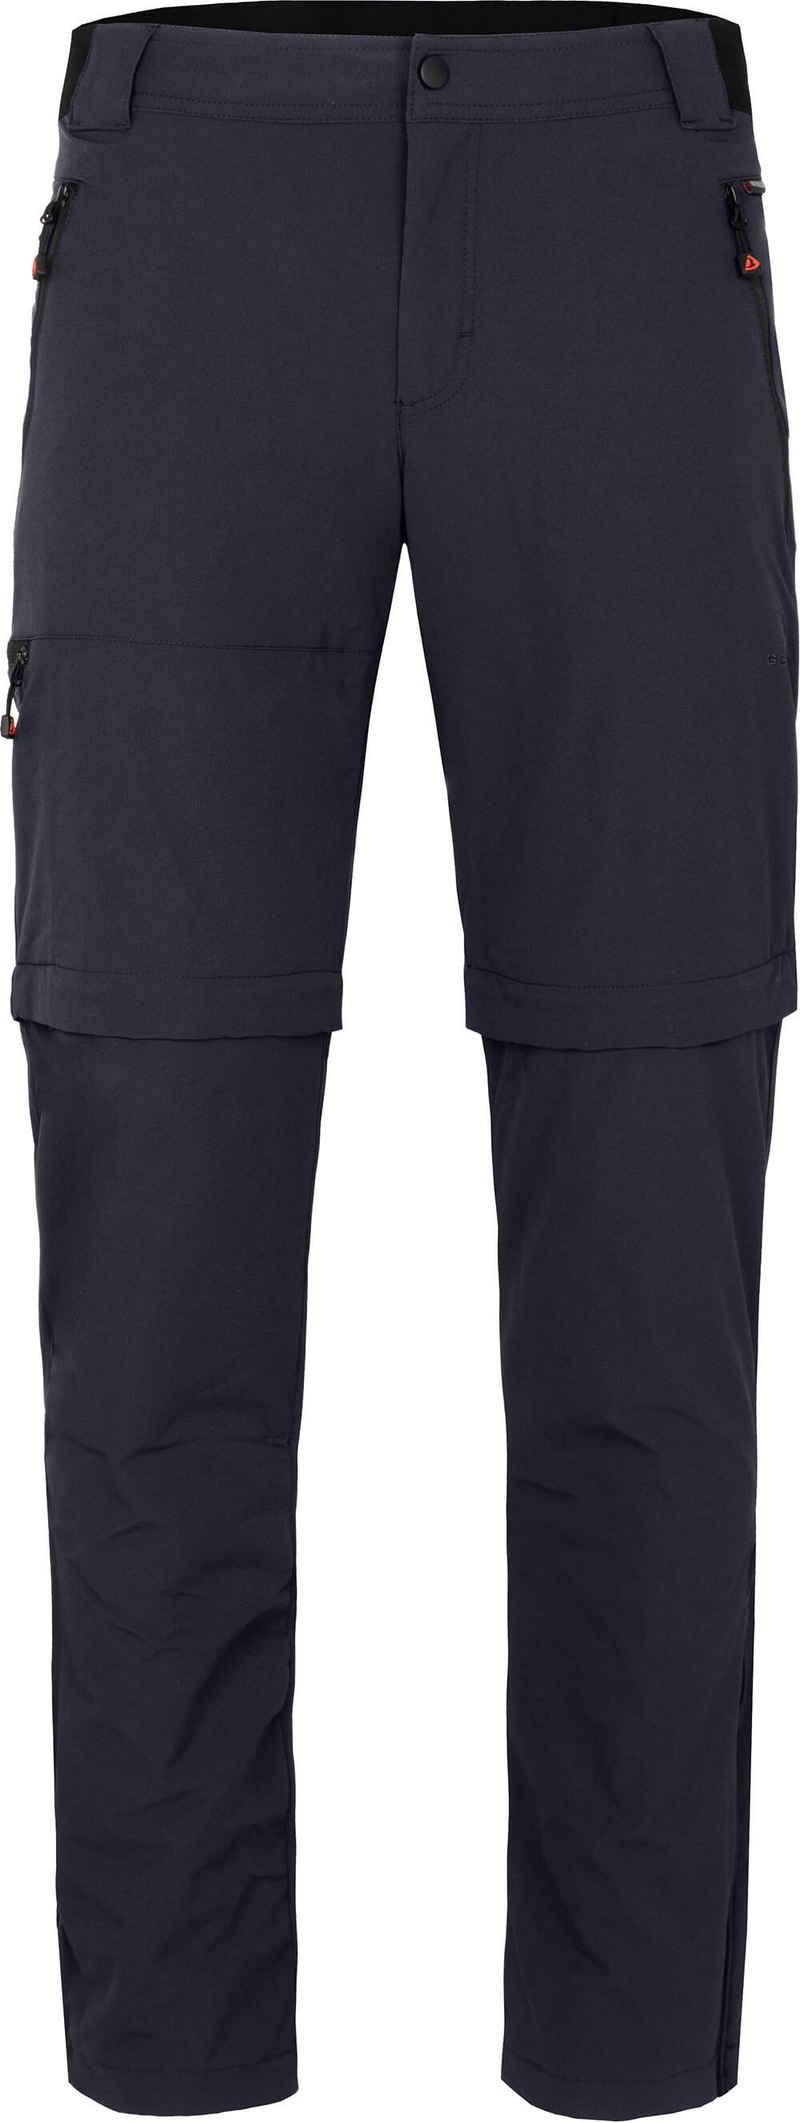 Bergson Zip-off-Hose »ARRESÖ COMFORT Zipp-Off (slim)« Herren Wanderhose, leicht, strapazierfähig, Kurzgrößen, Nacht blau